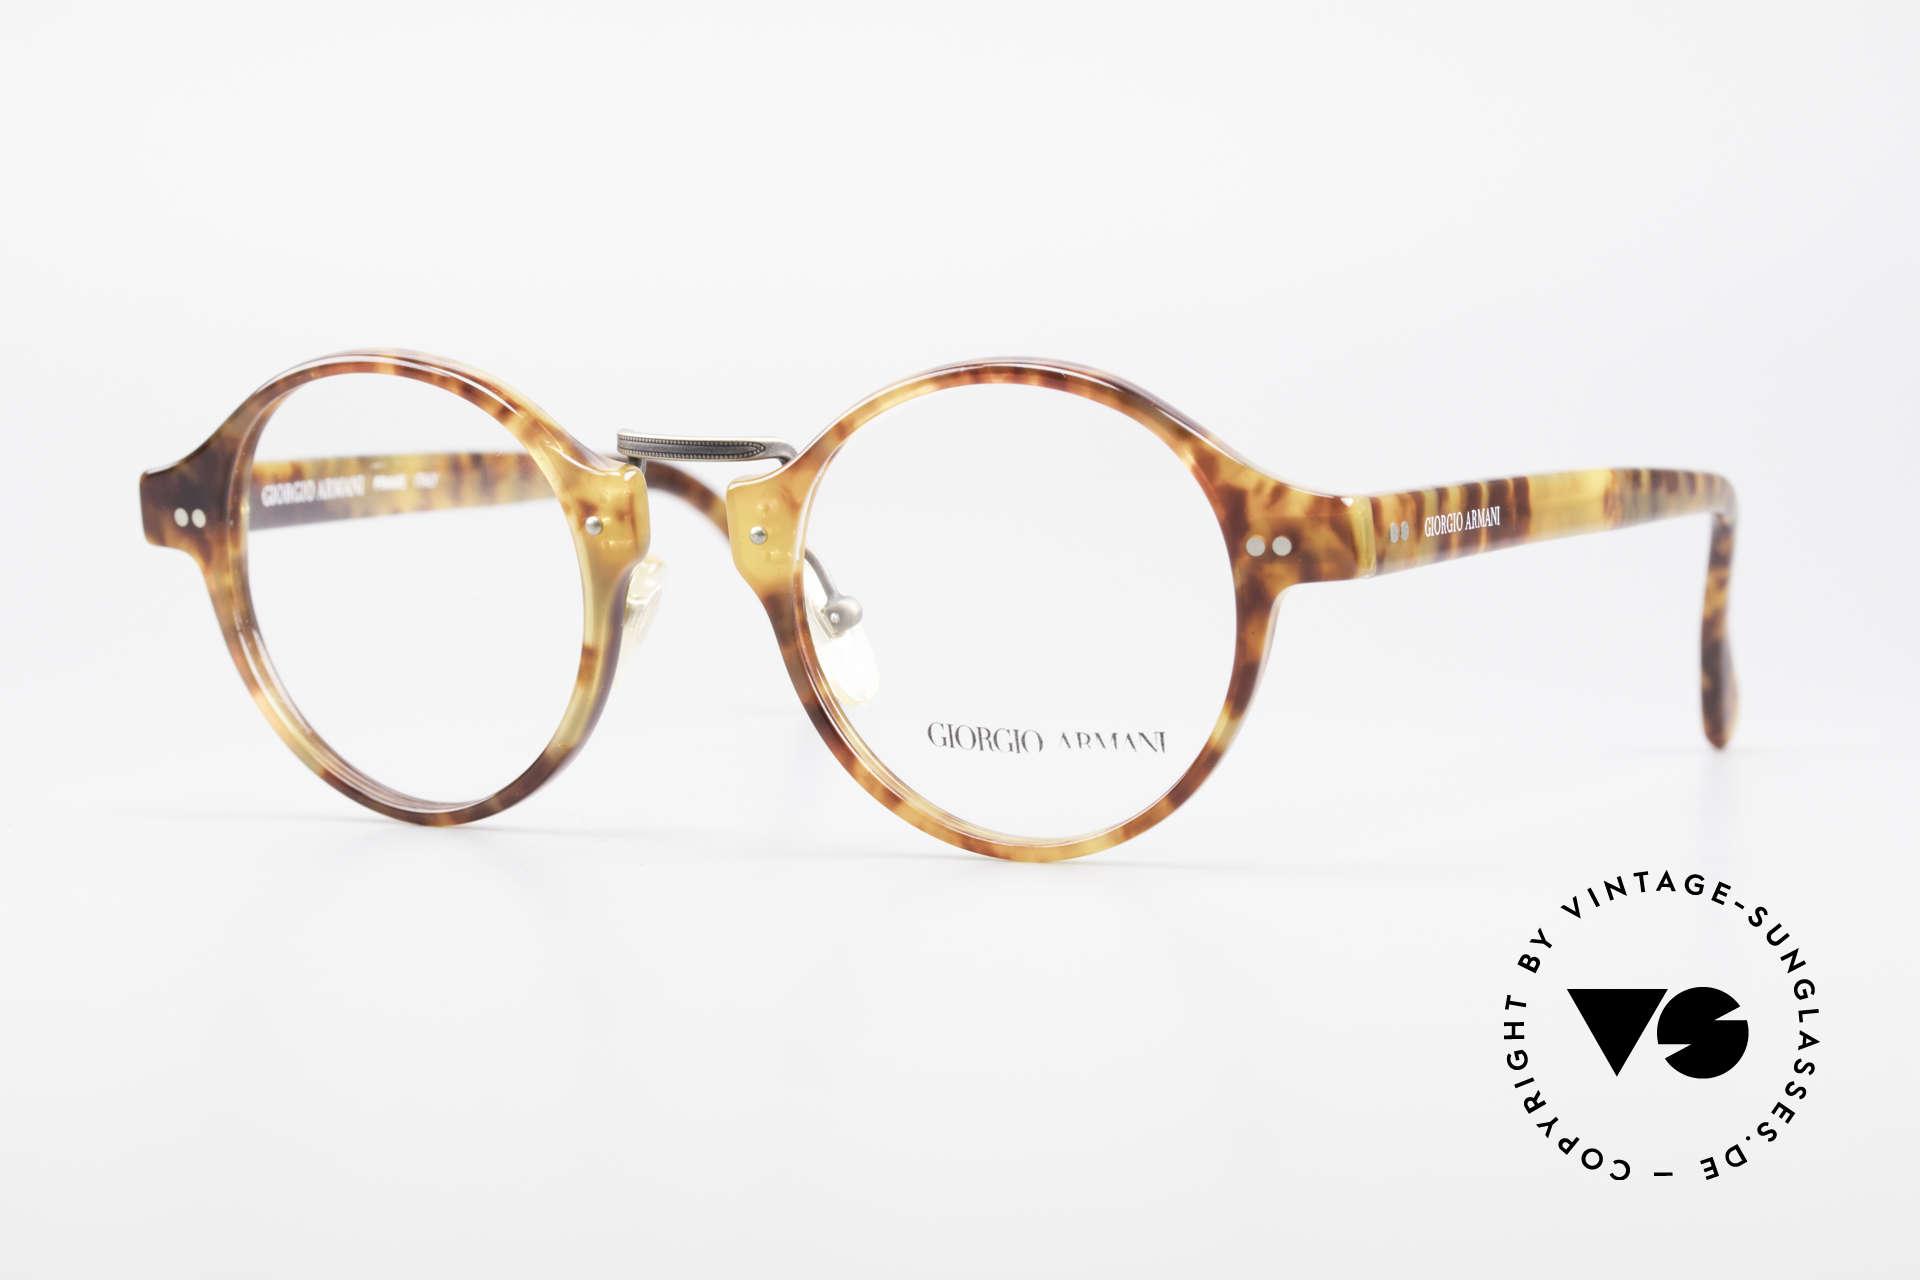 Giorgio Armani 341 Vintage Panto Eyeglass-Frame, timeless vintage Giorgio Armani designer eyeglasses, Made for Men